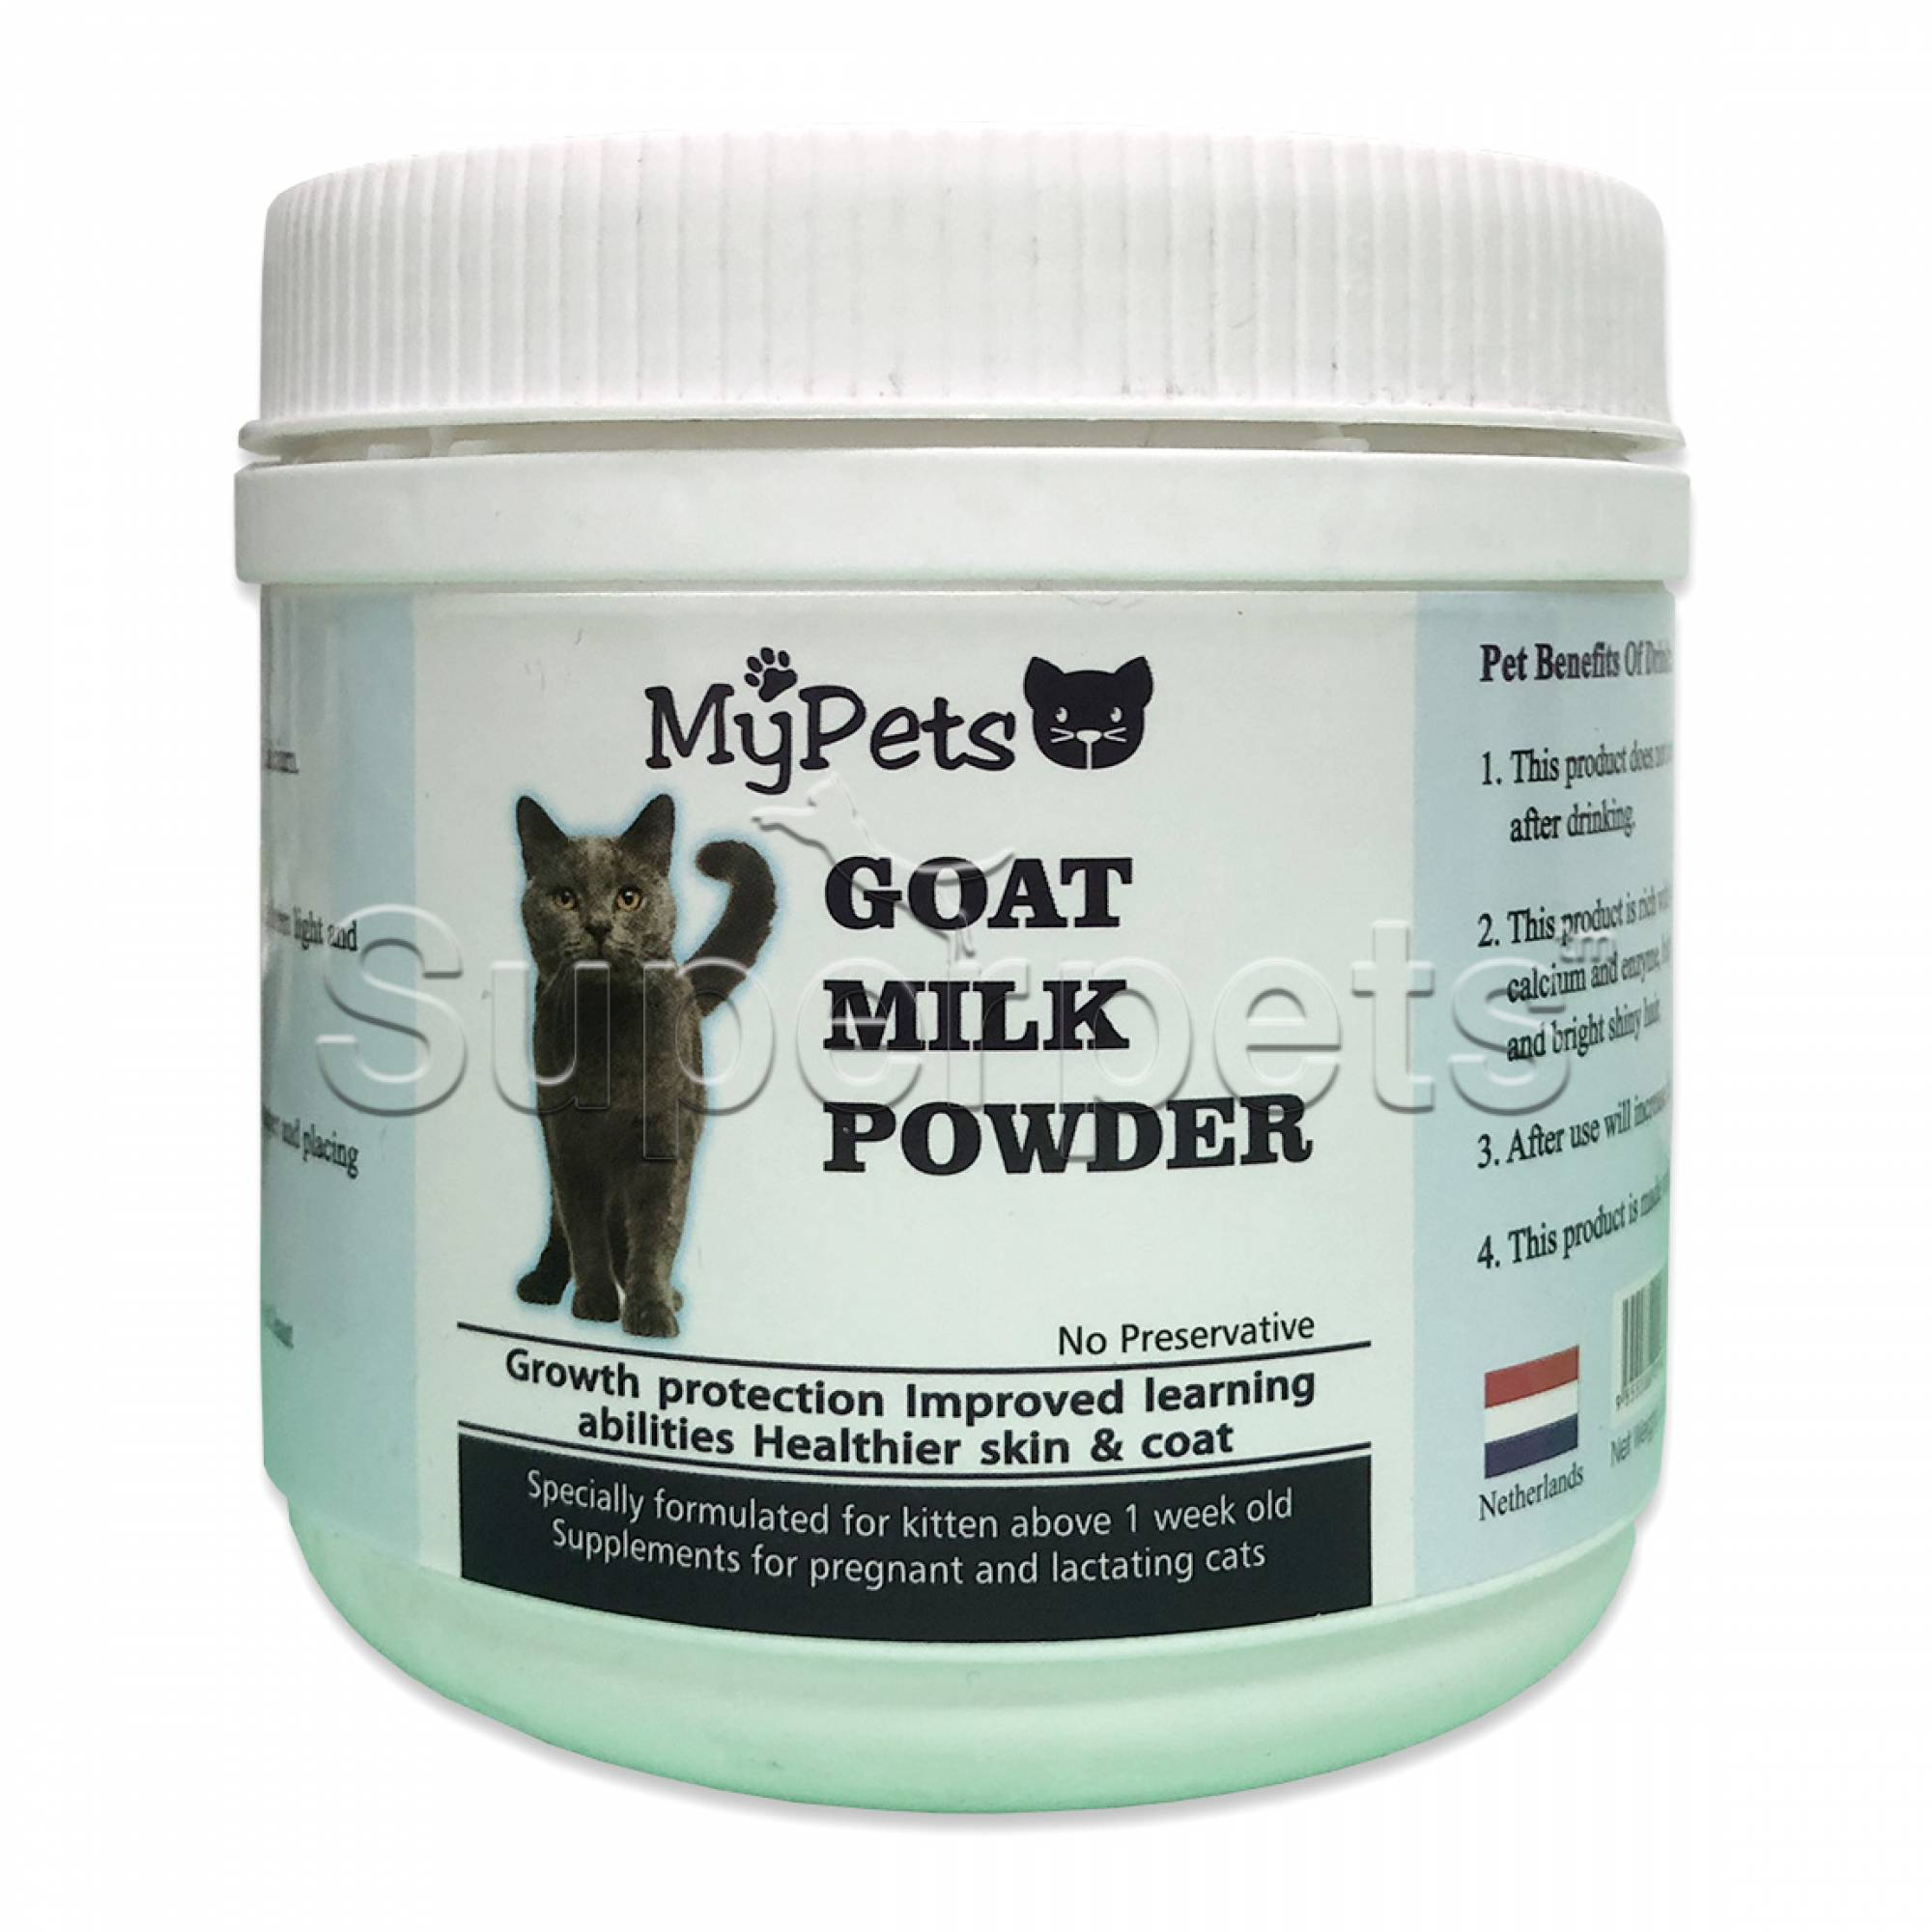 MyPets Goat Milk Powder for Kittens & Lactating Cats 250g